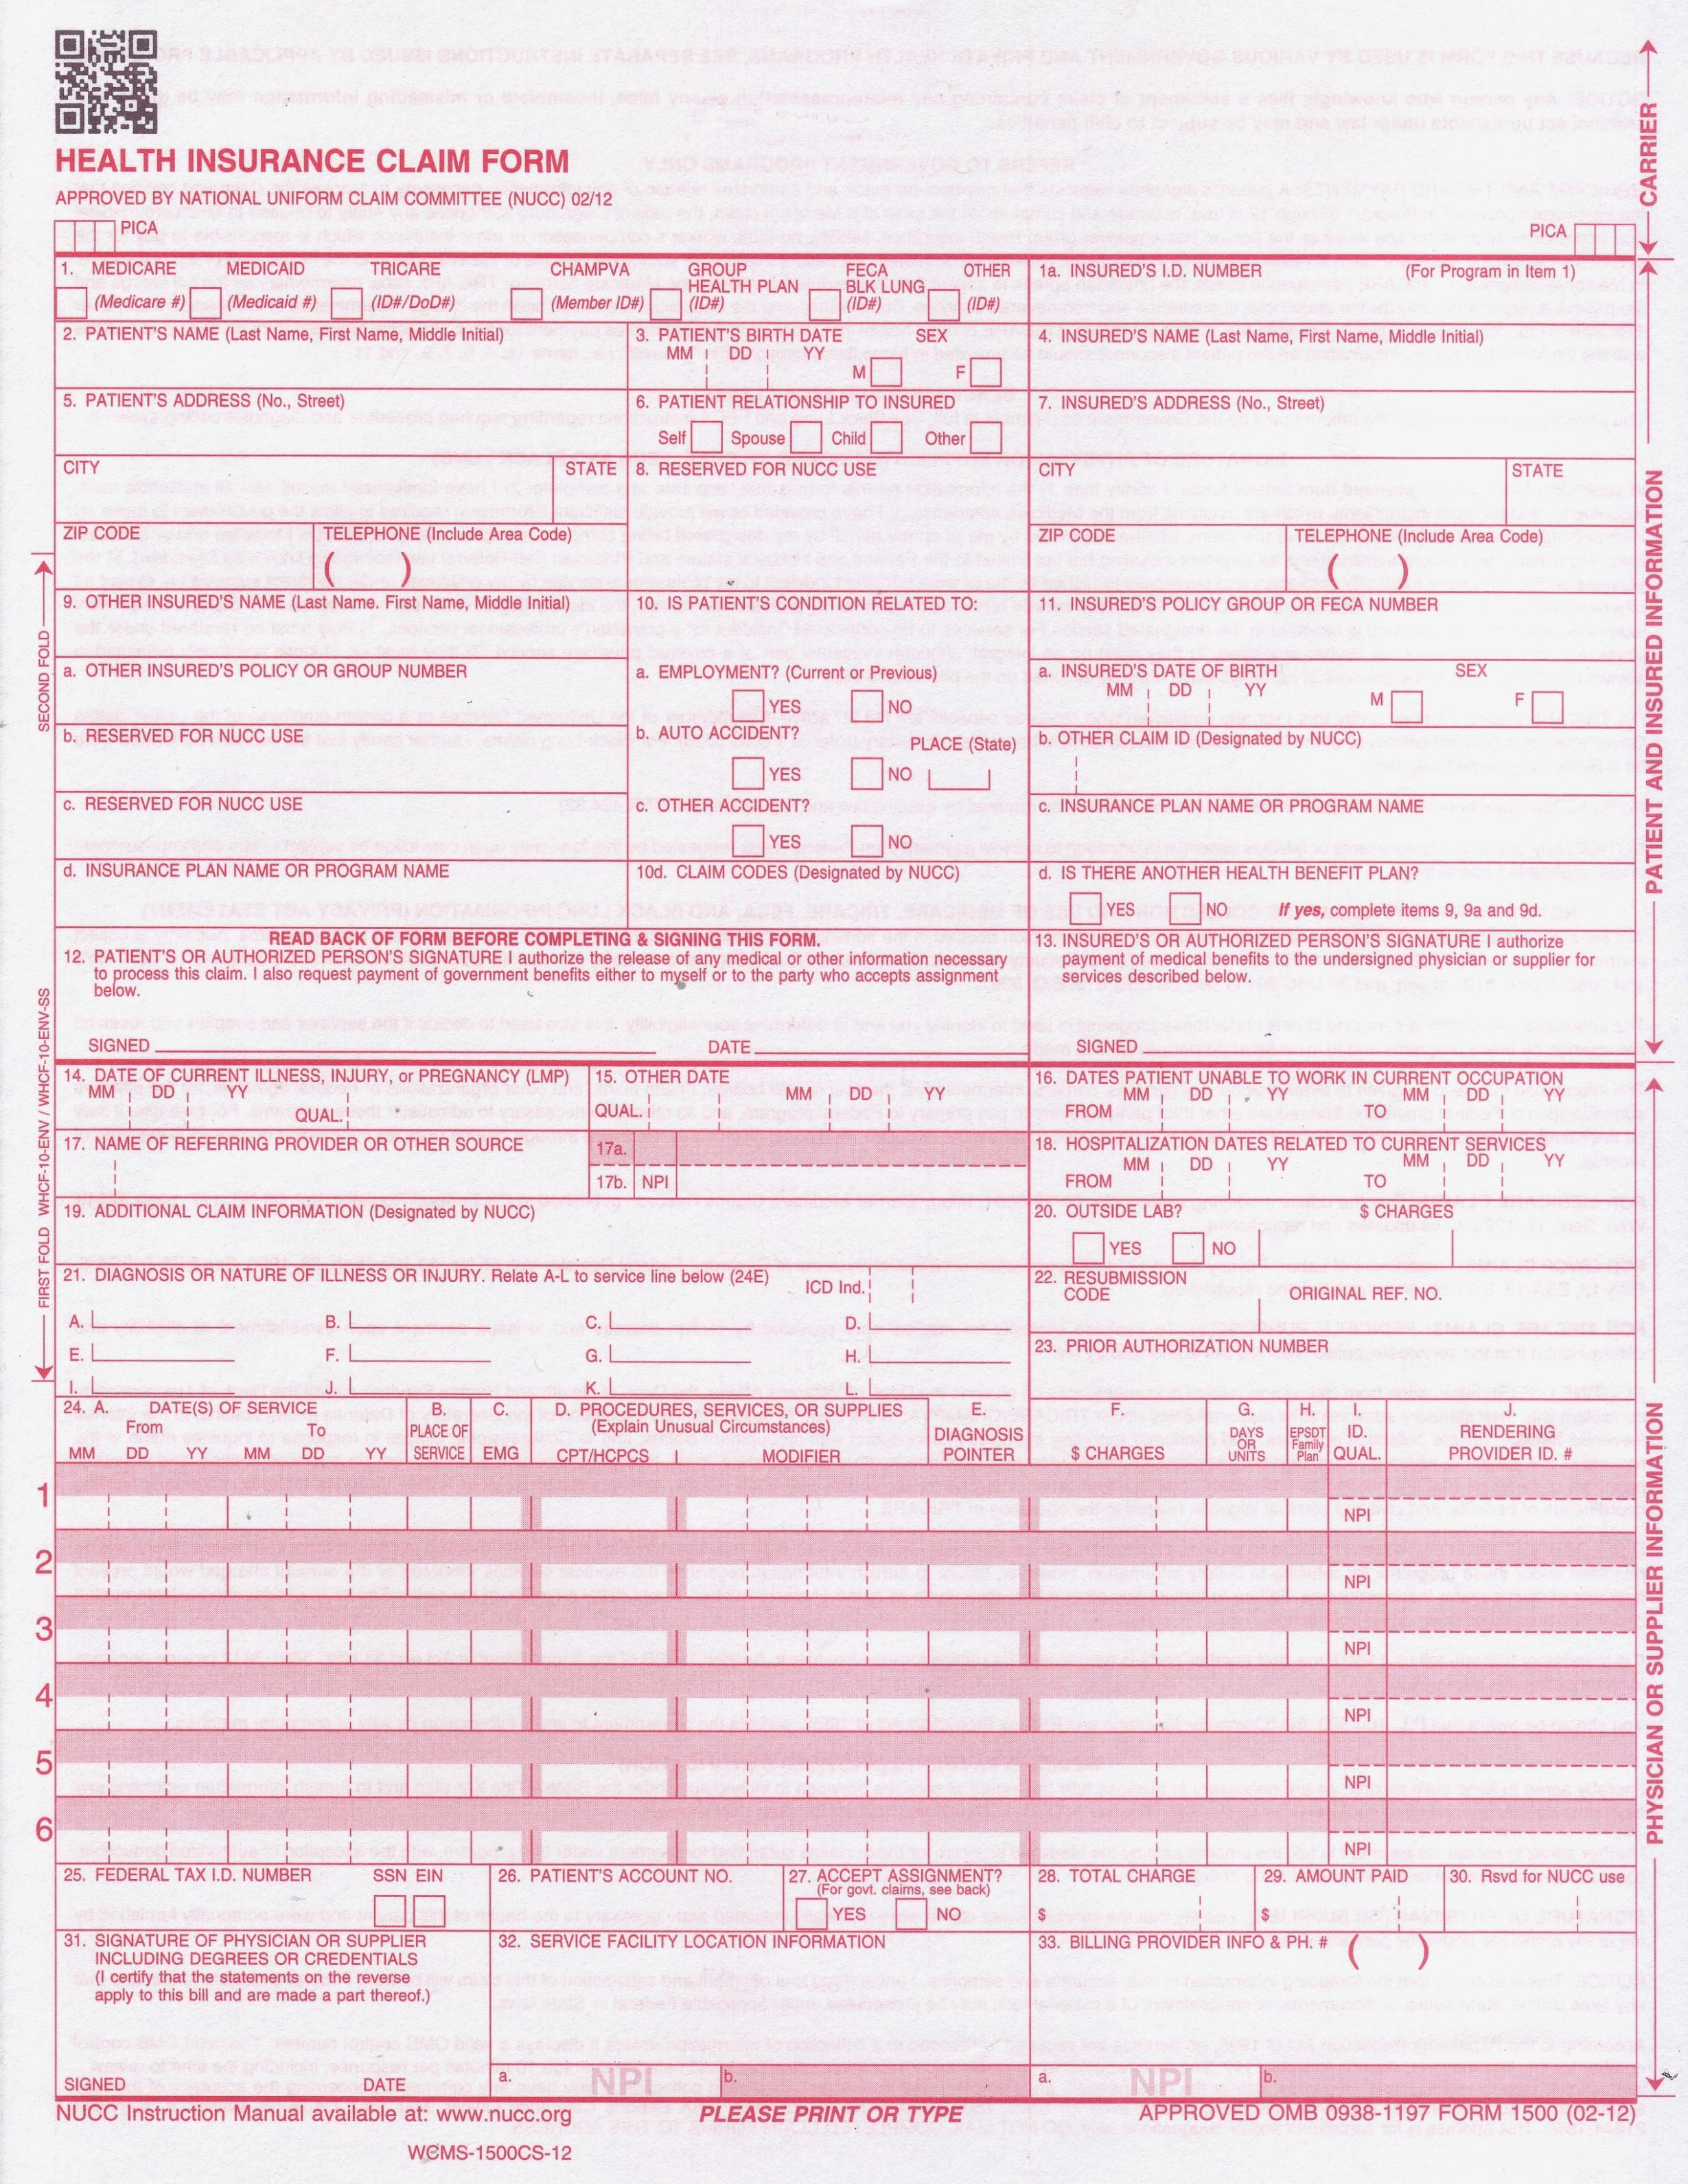 Printable Cms 1500 Form Pdf